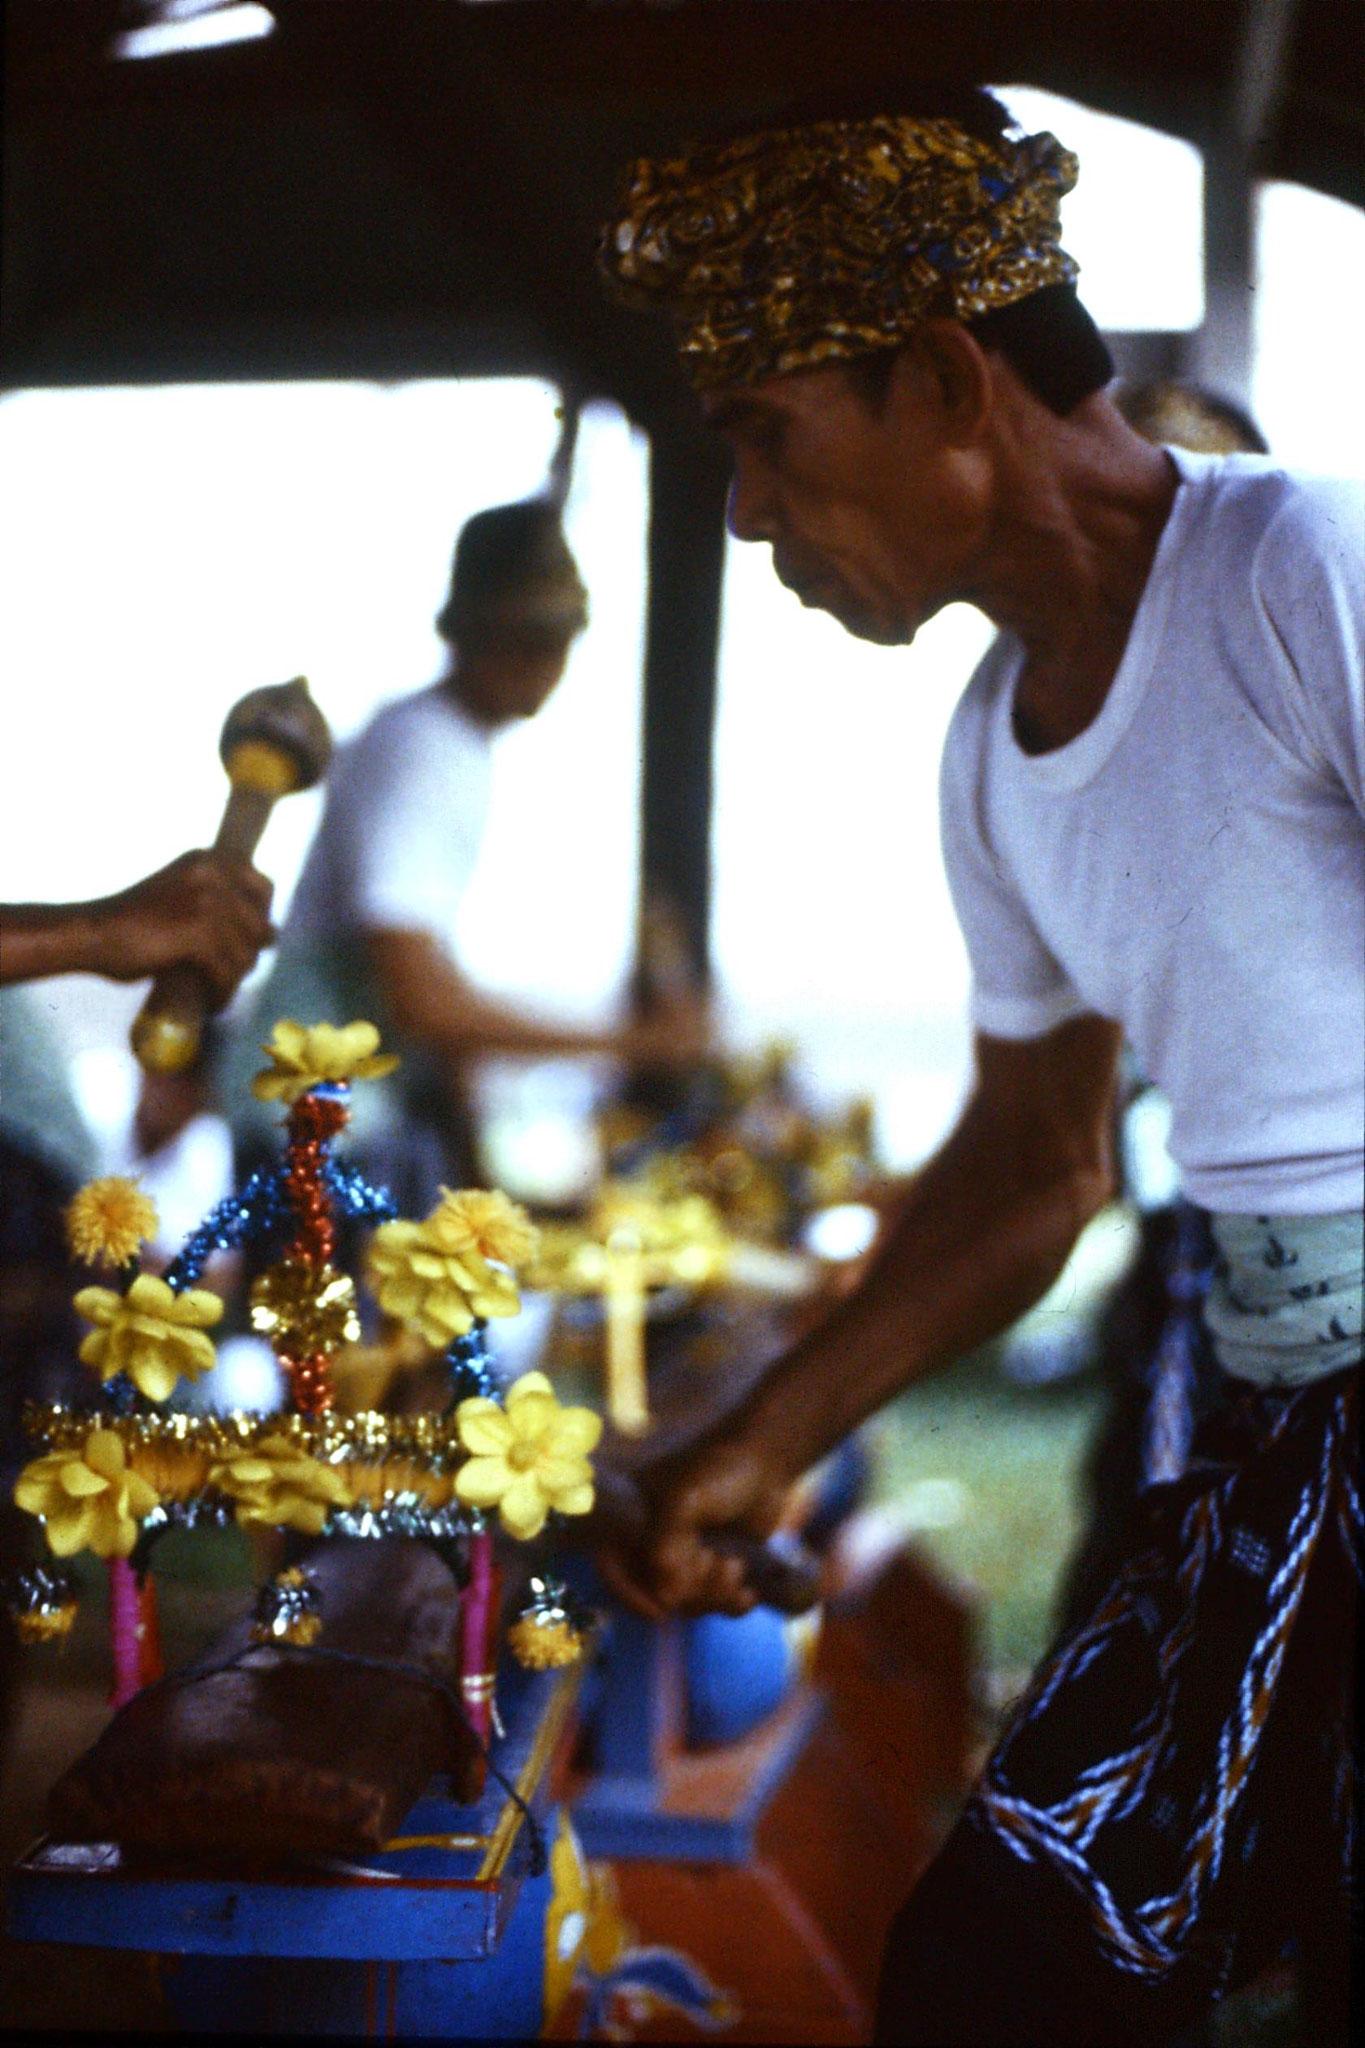 20/6/1990: 20: Kota Bharu cultural show